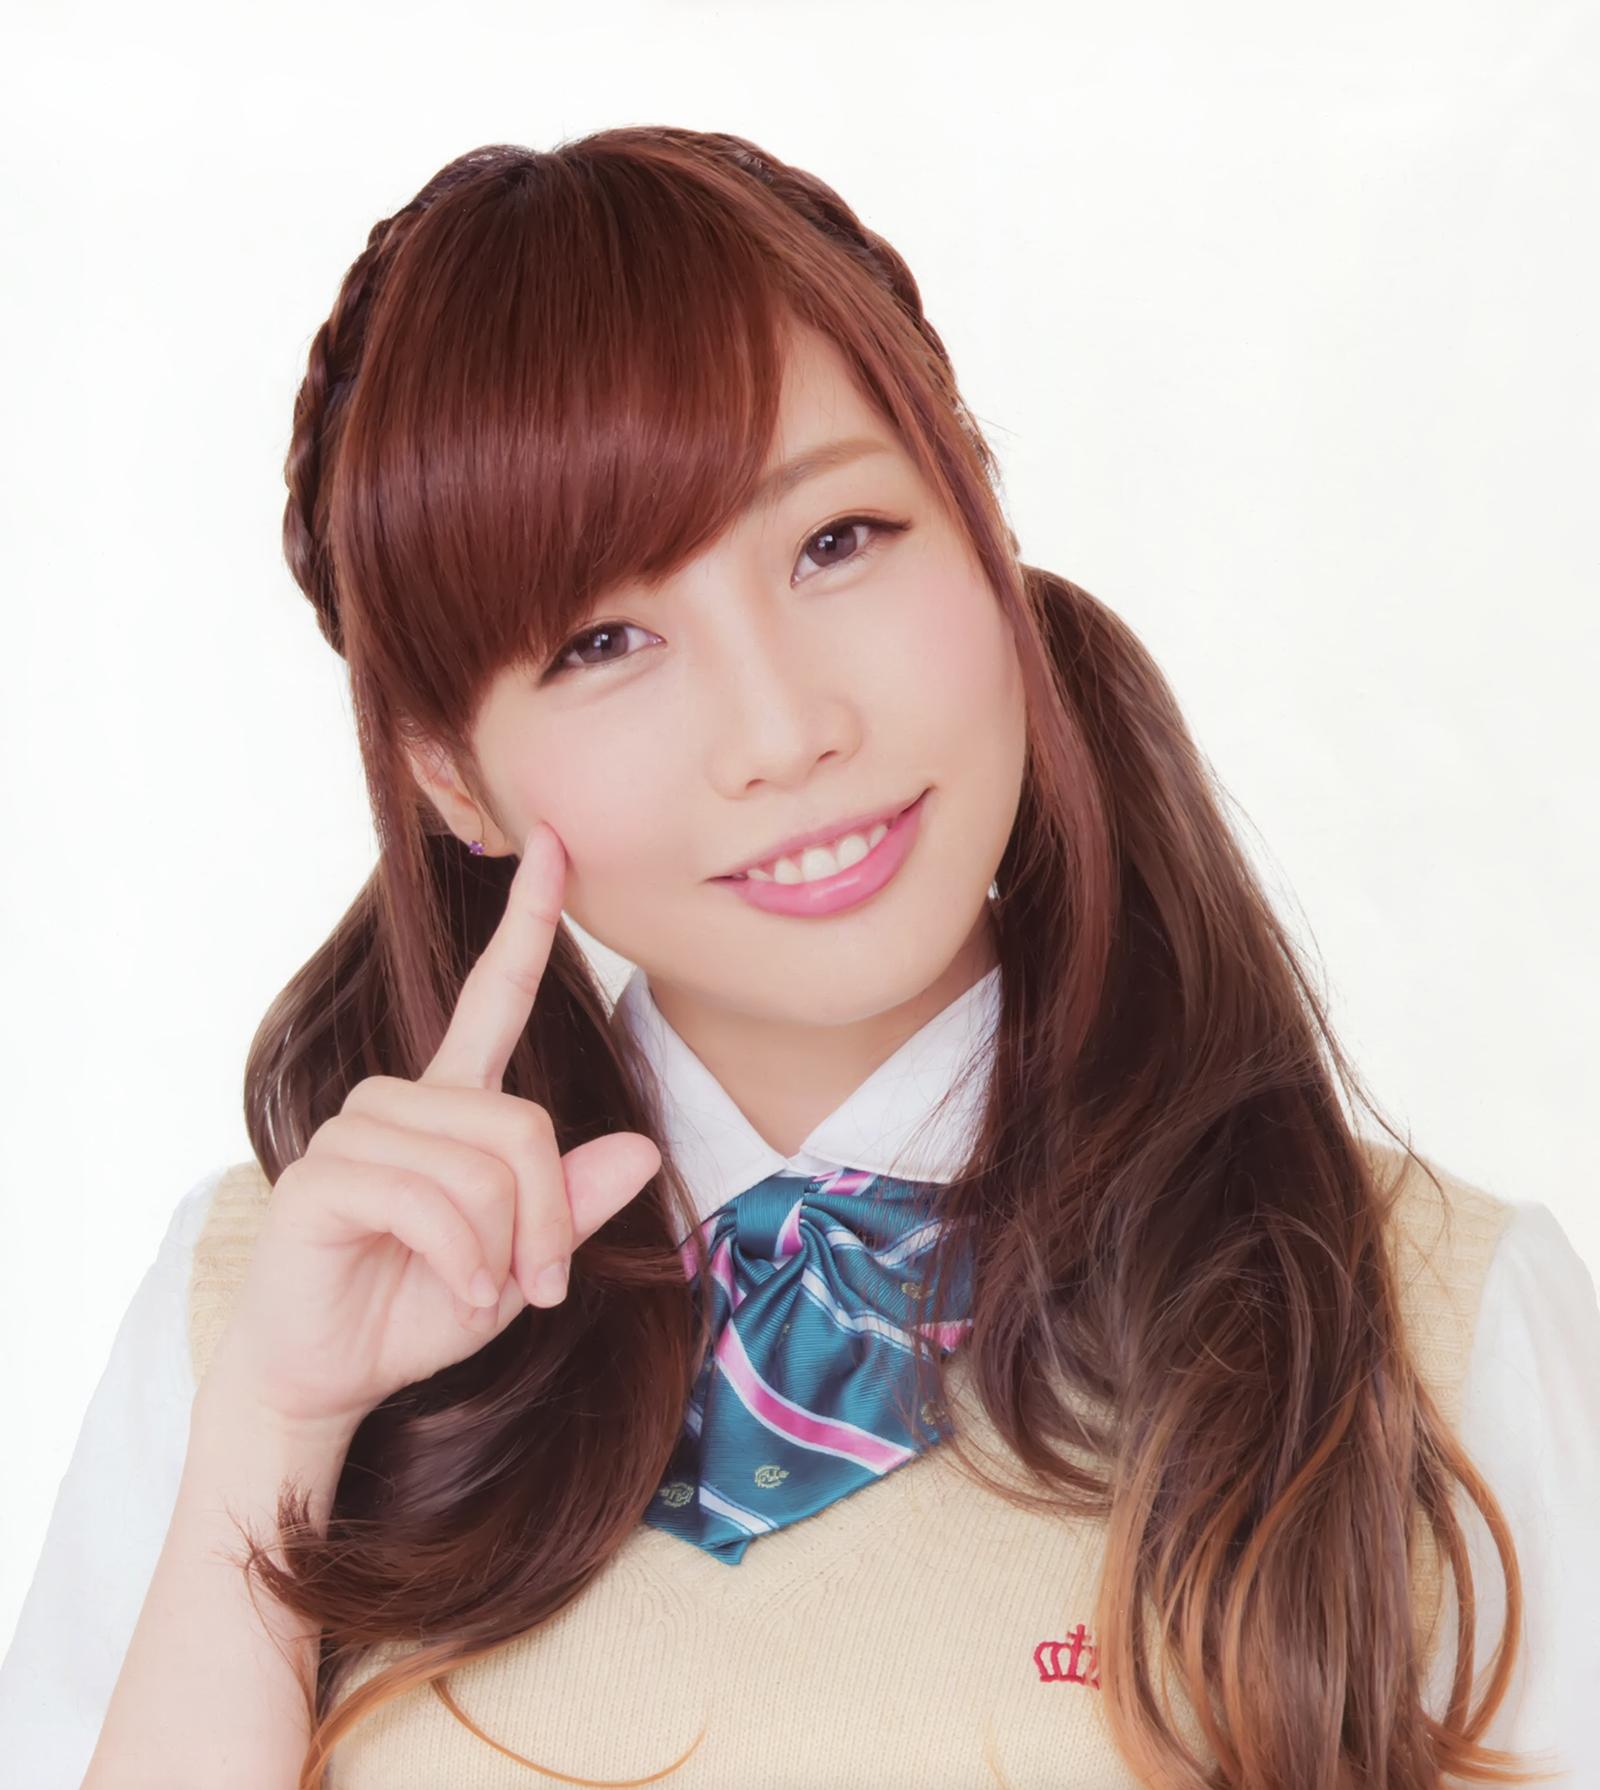 File:Kusuda Aina Infobox Image.jpg